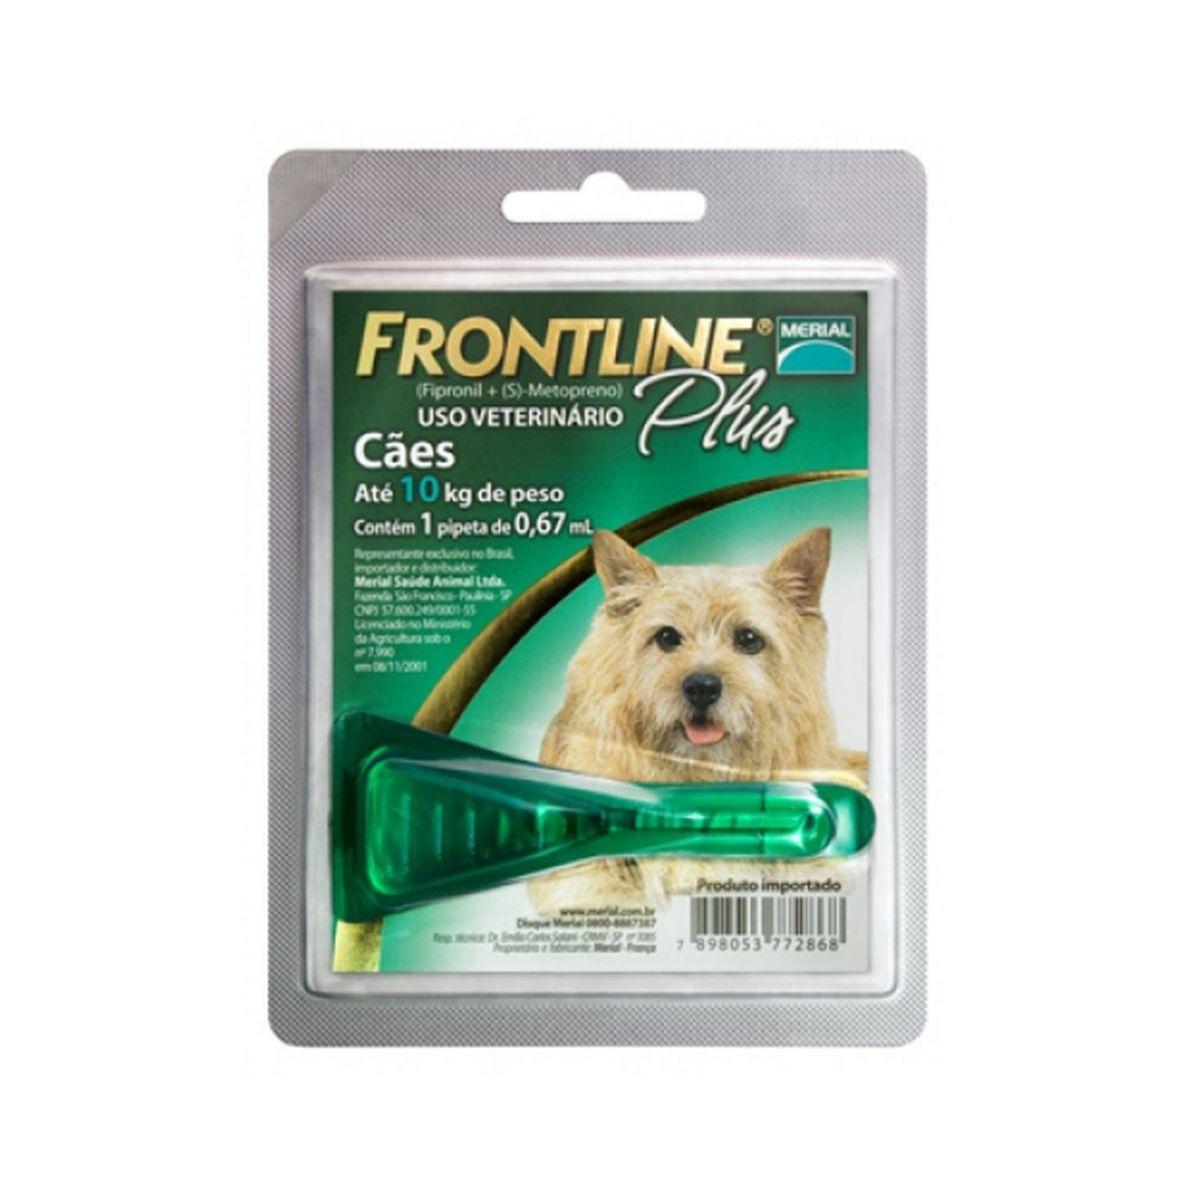 Frontline Plus 01 a 10Kg. P 0,67ml  - Farmácia do Cavalo